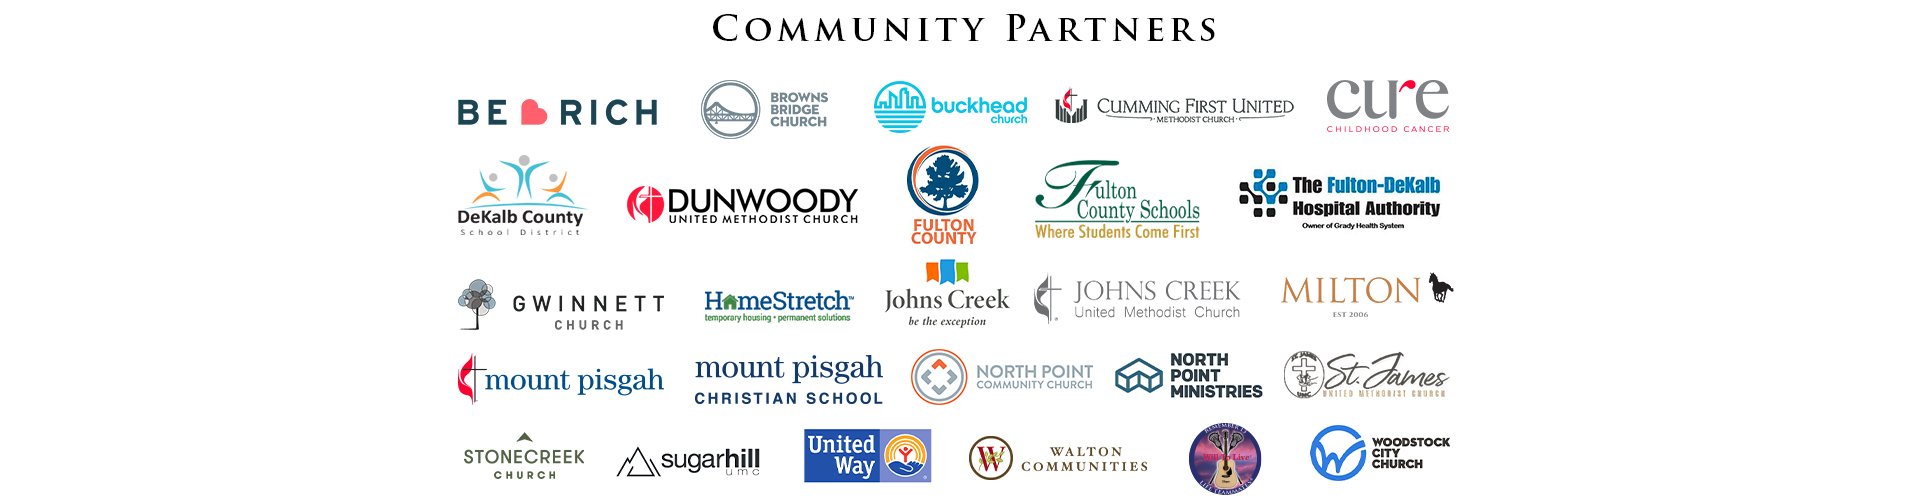 2020-community-partners-banner